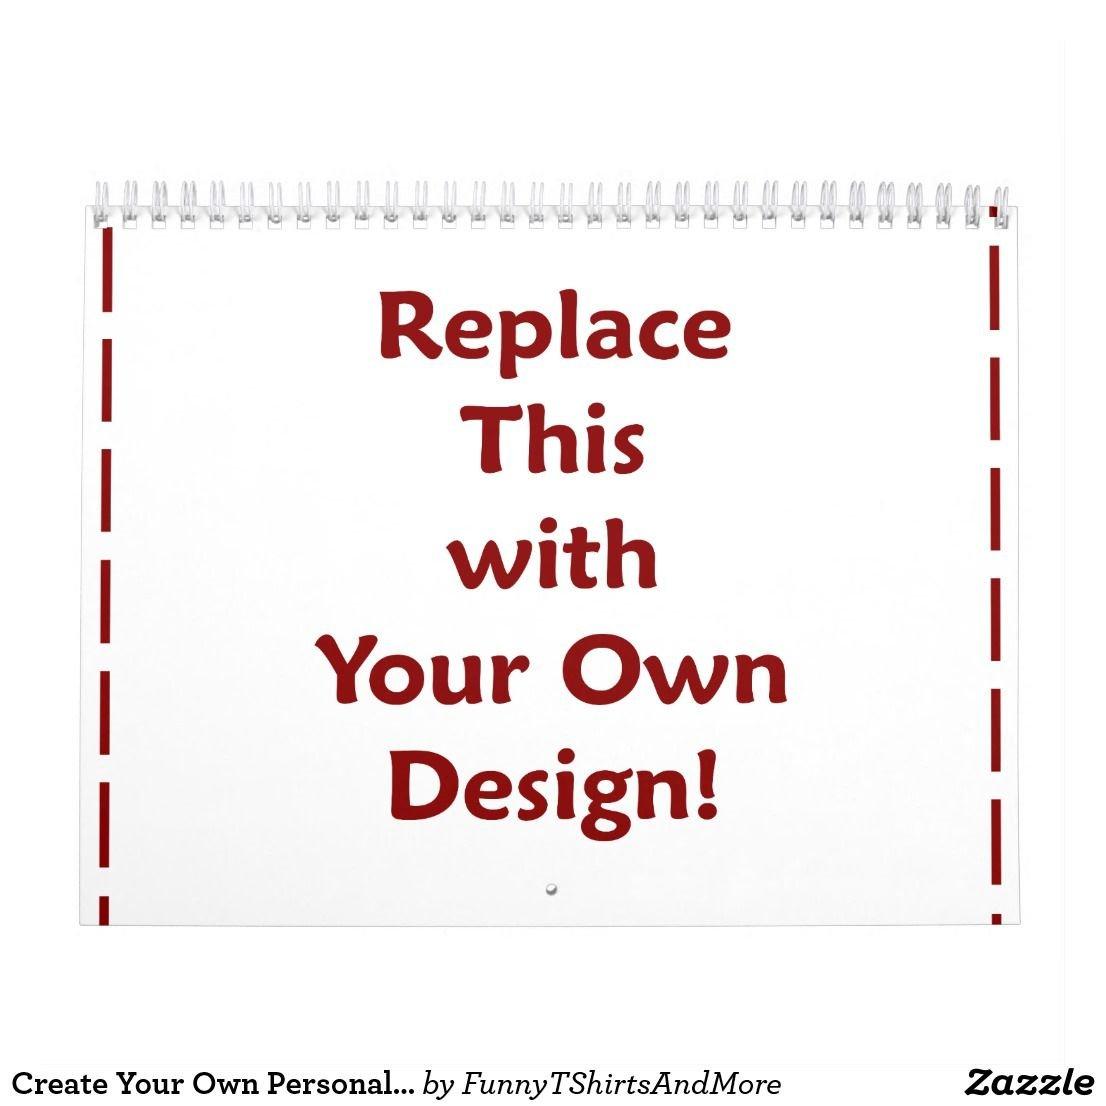 Create Your Own Personalized Custom 2019 Diy Calendar   Zazzle Calendar 2019 Create